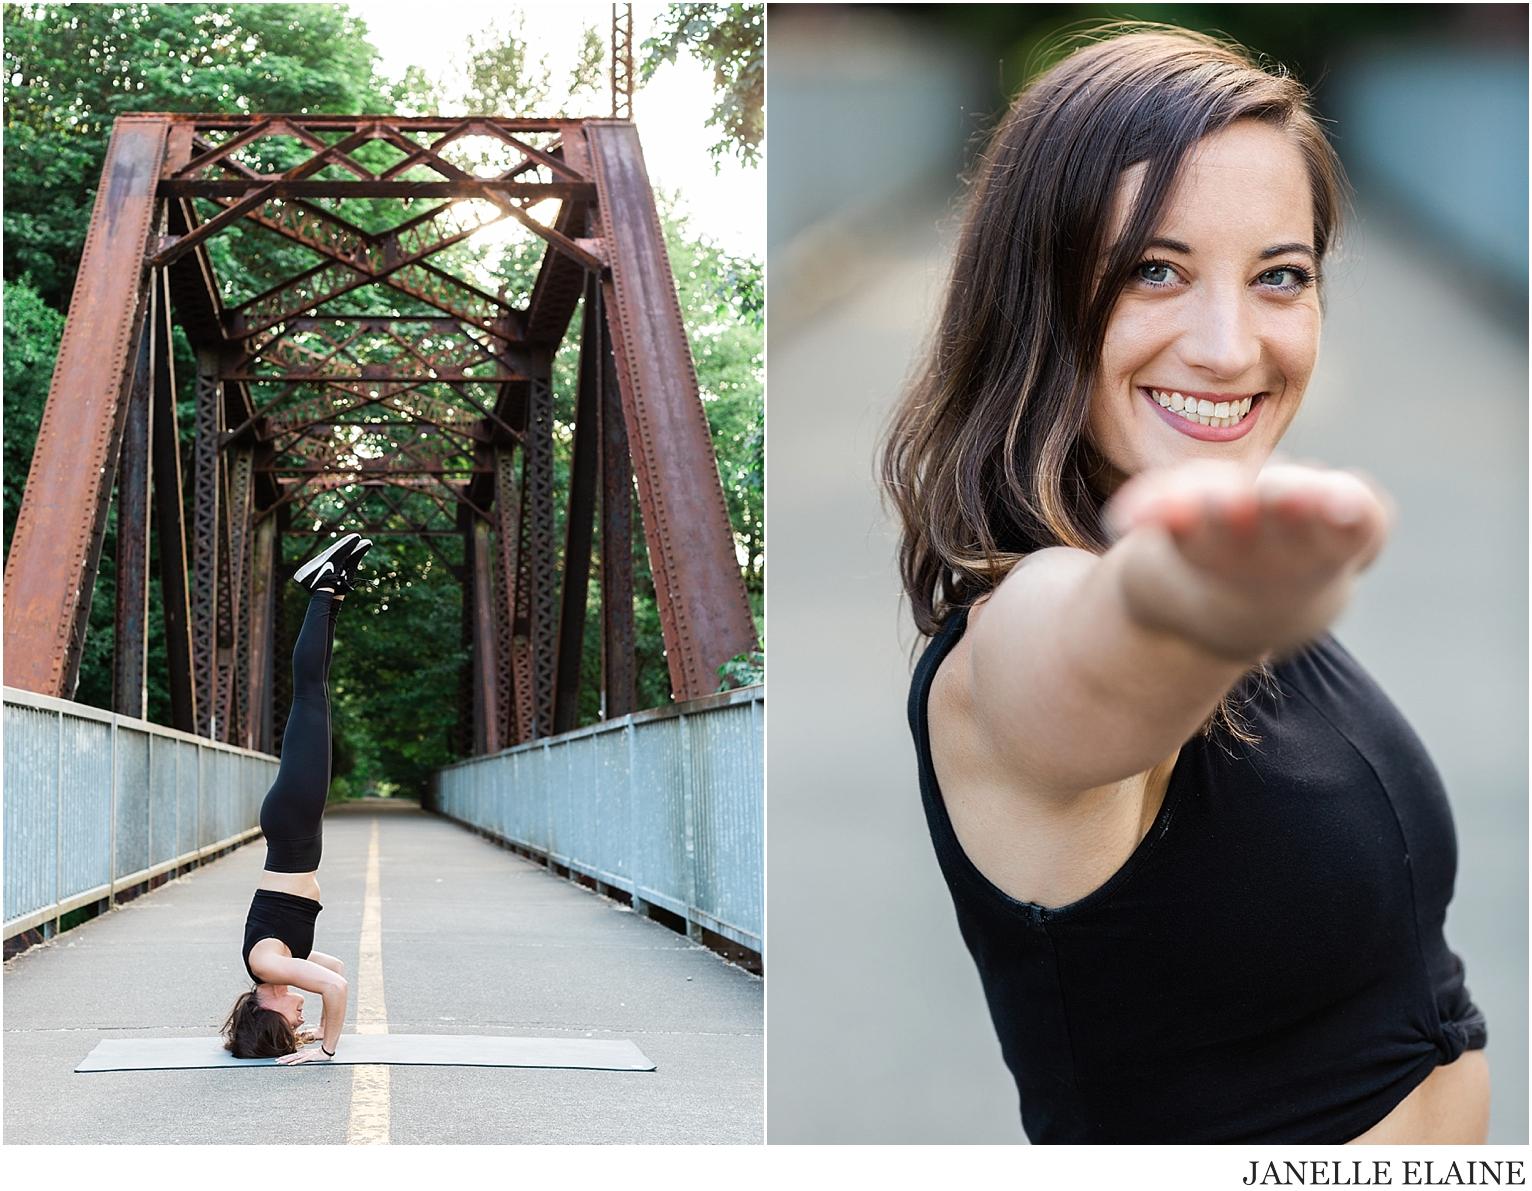 Serena-Yoga Branding-Photo Session-Renton, WA-Janelle Elaine Photography-53.jpg